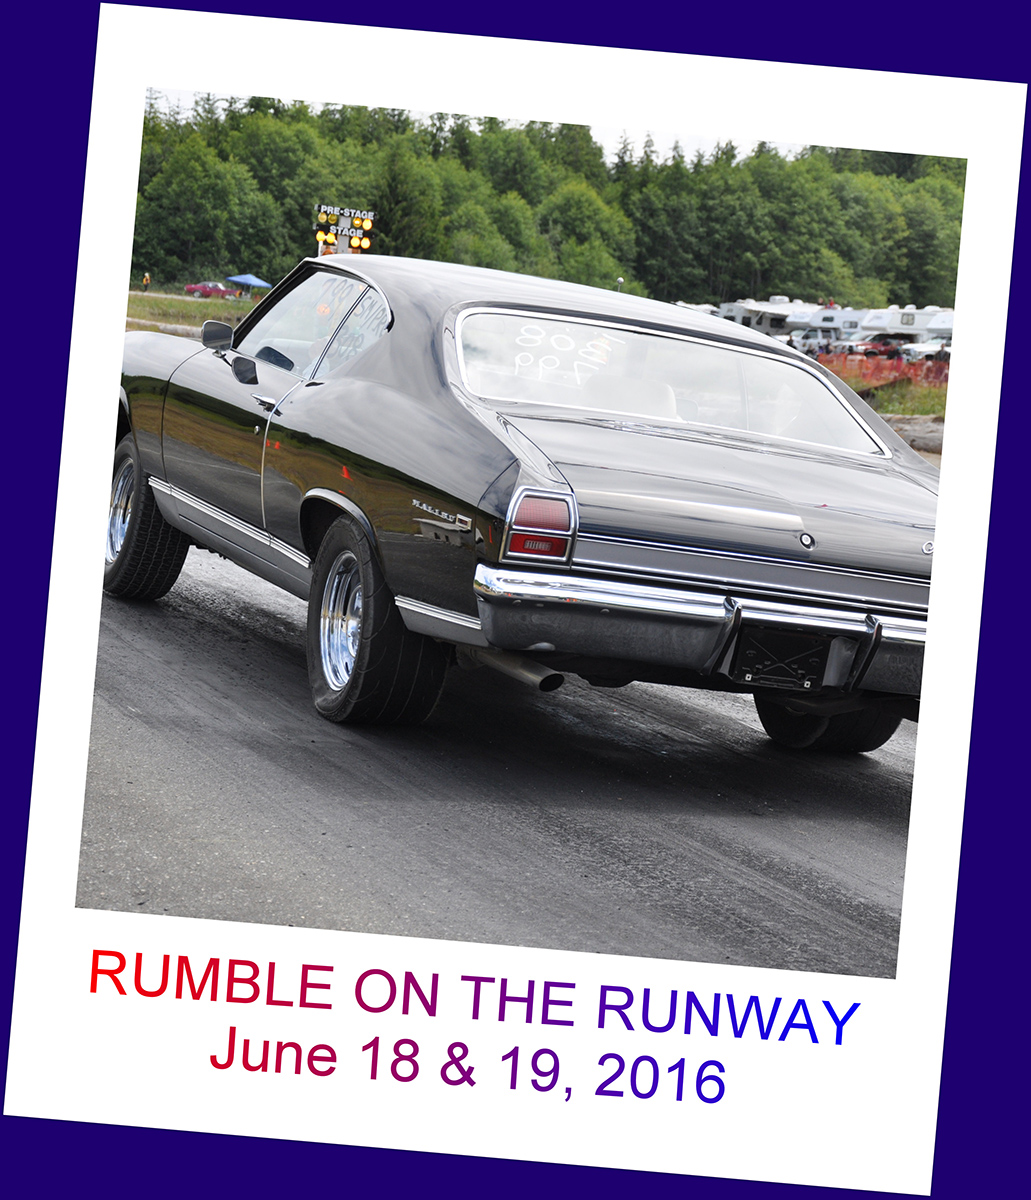 Rumble on the Runway June 18 & 19, 2016 677